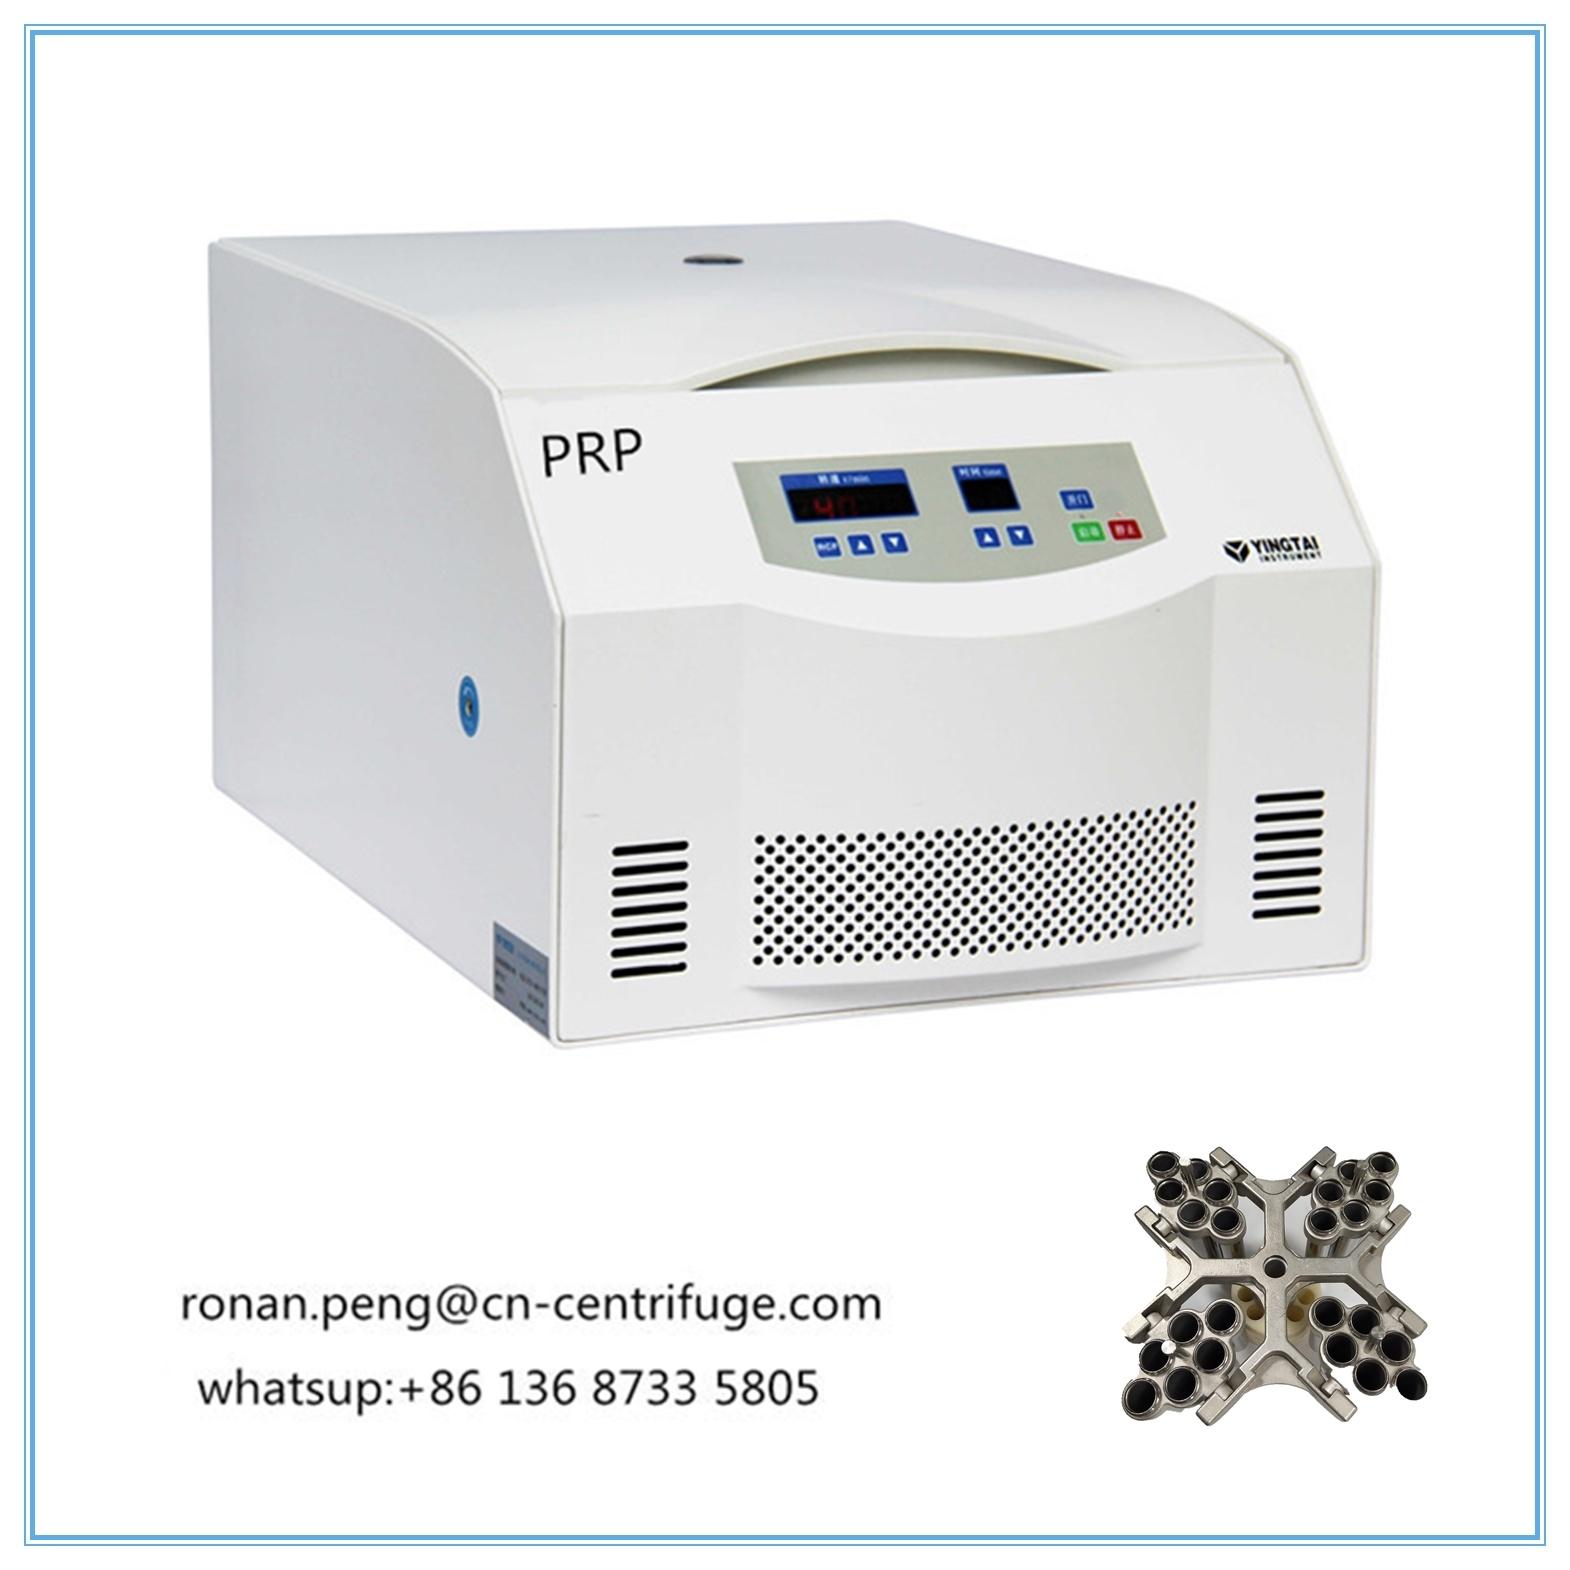 [Hot Item] Prp Machine/ Centrifuge with Prp Kit, 10ml, 15ml, 20ml, 30ml,  50ml